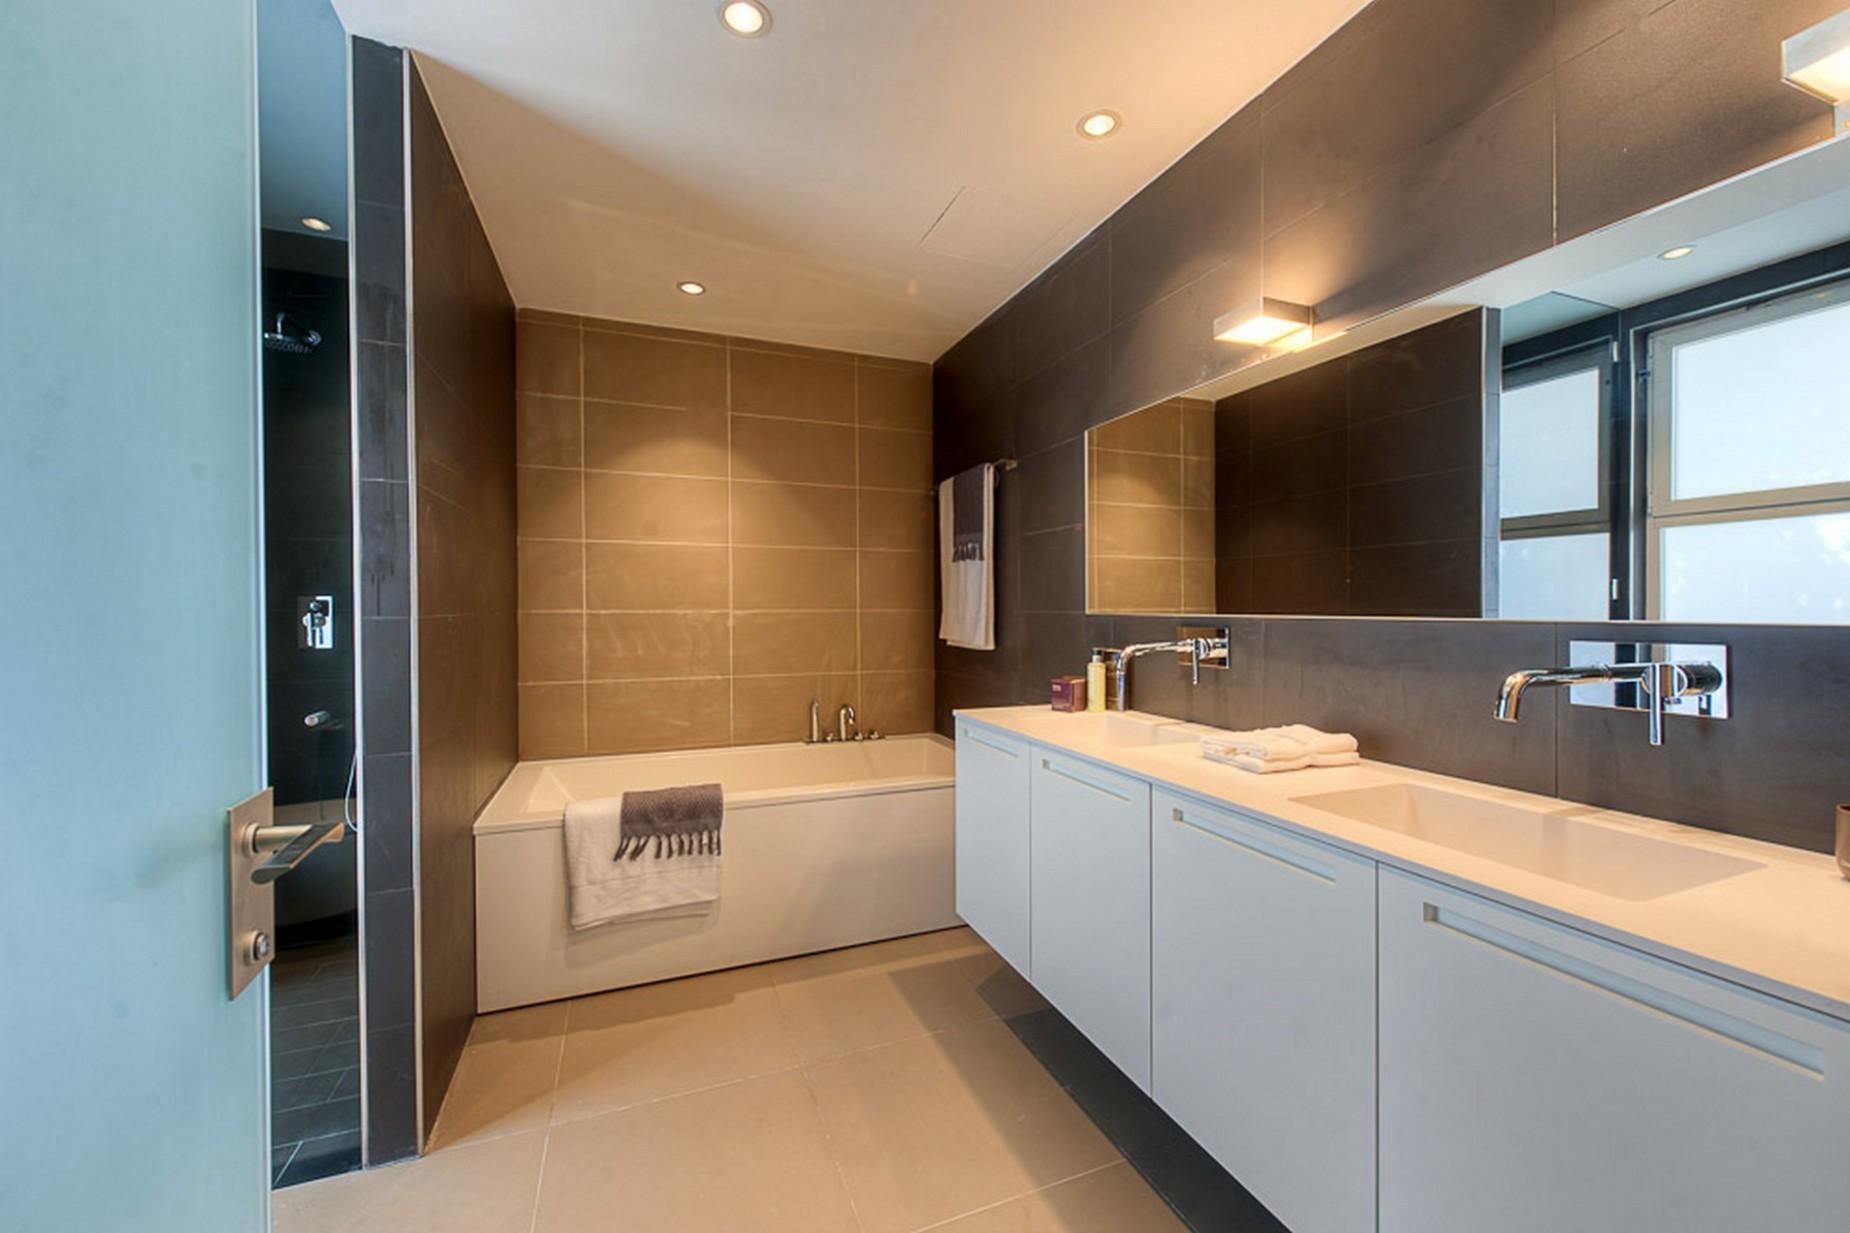 3 bed Villa For Rent in Bahar ic-Caghaq, Bahar ic-Caghaq - thumb 6